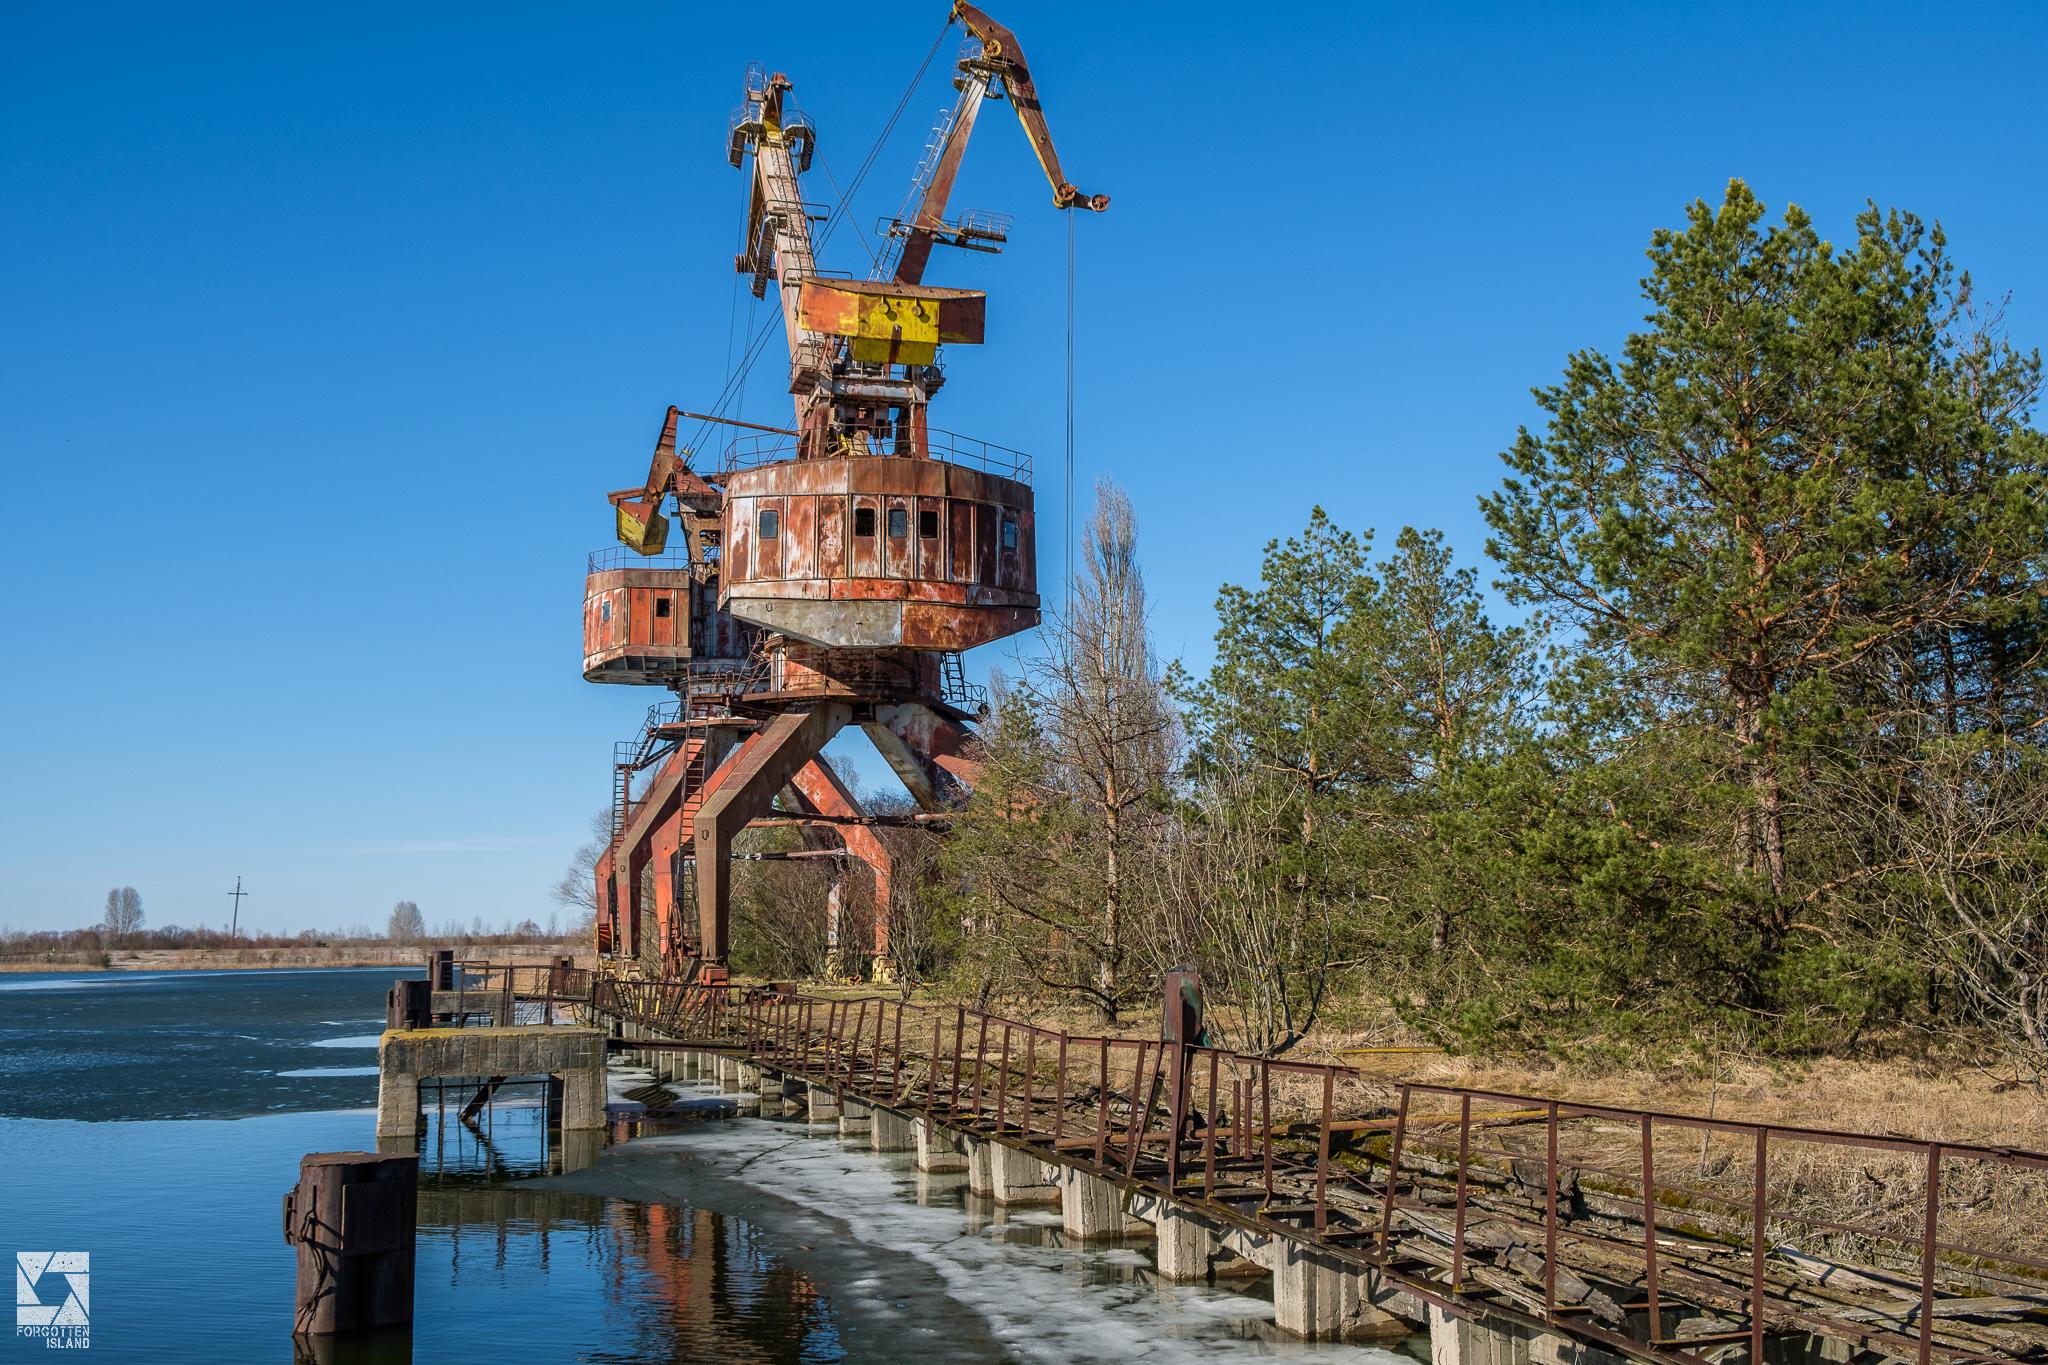 Pripyat Cargo Dock Cranes - Revisited in 2018